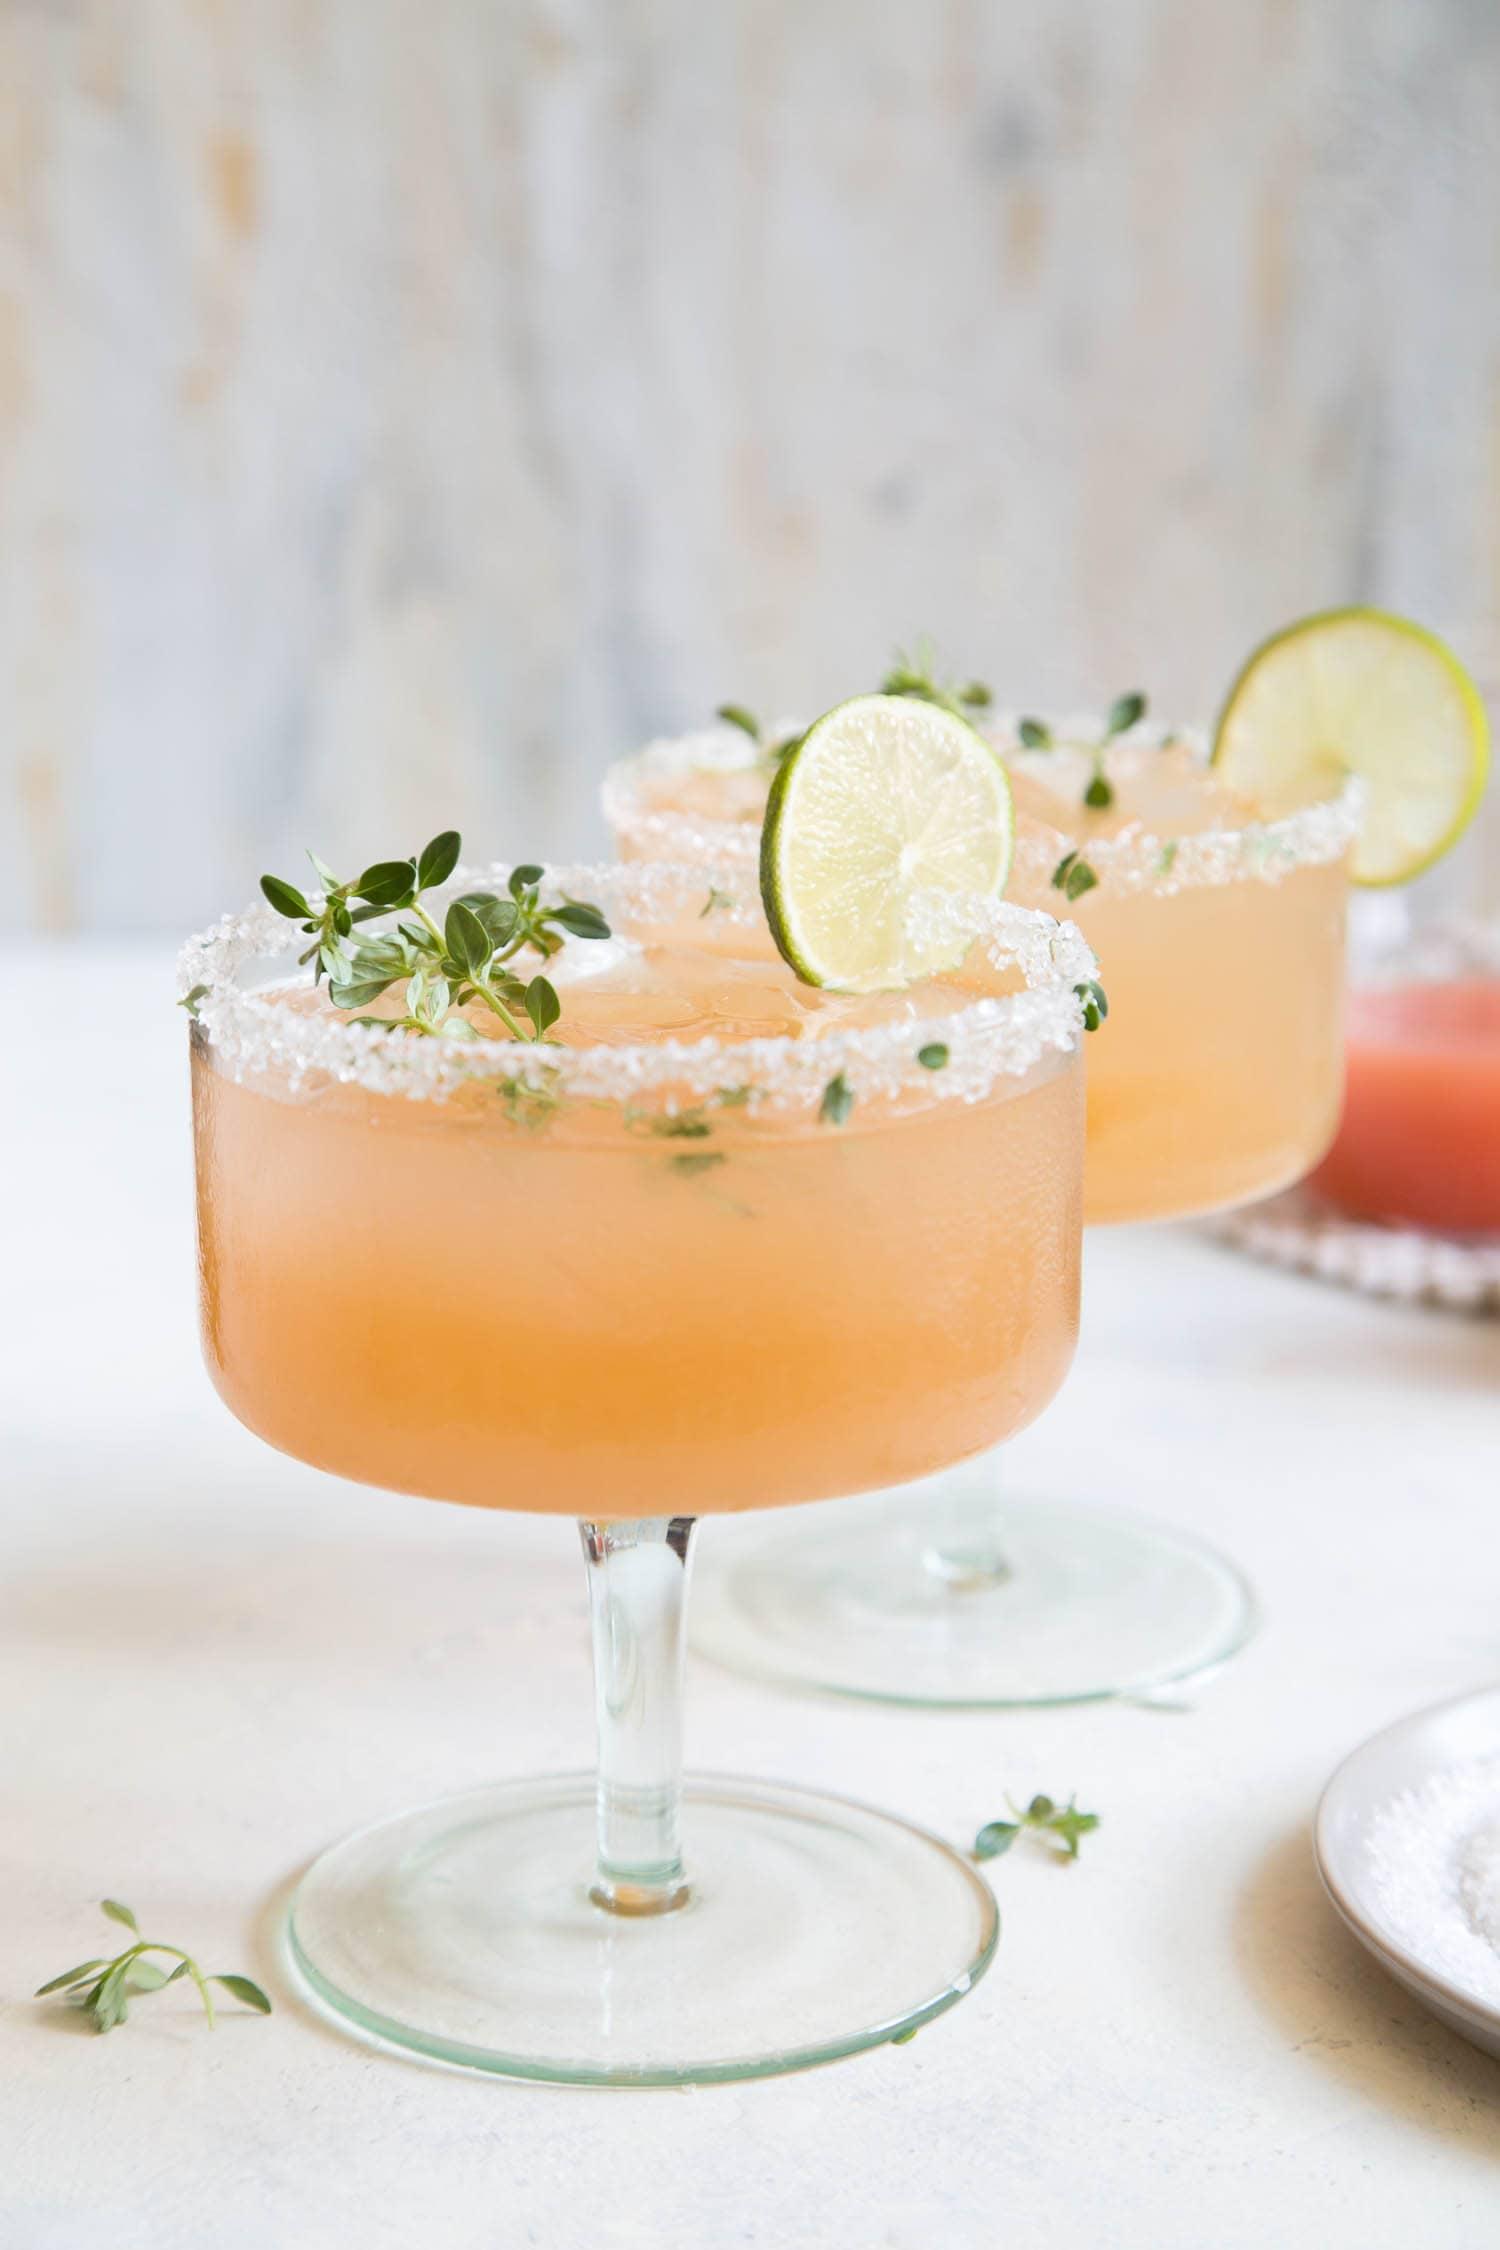 Honey Thyme Margarita